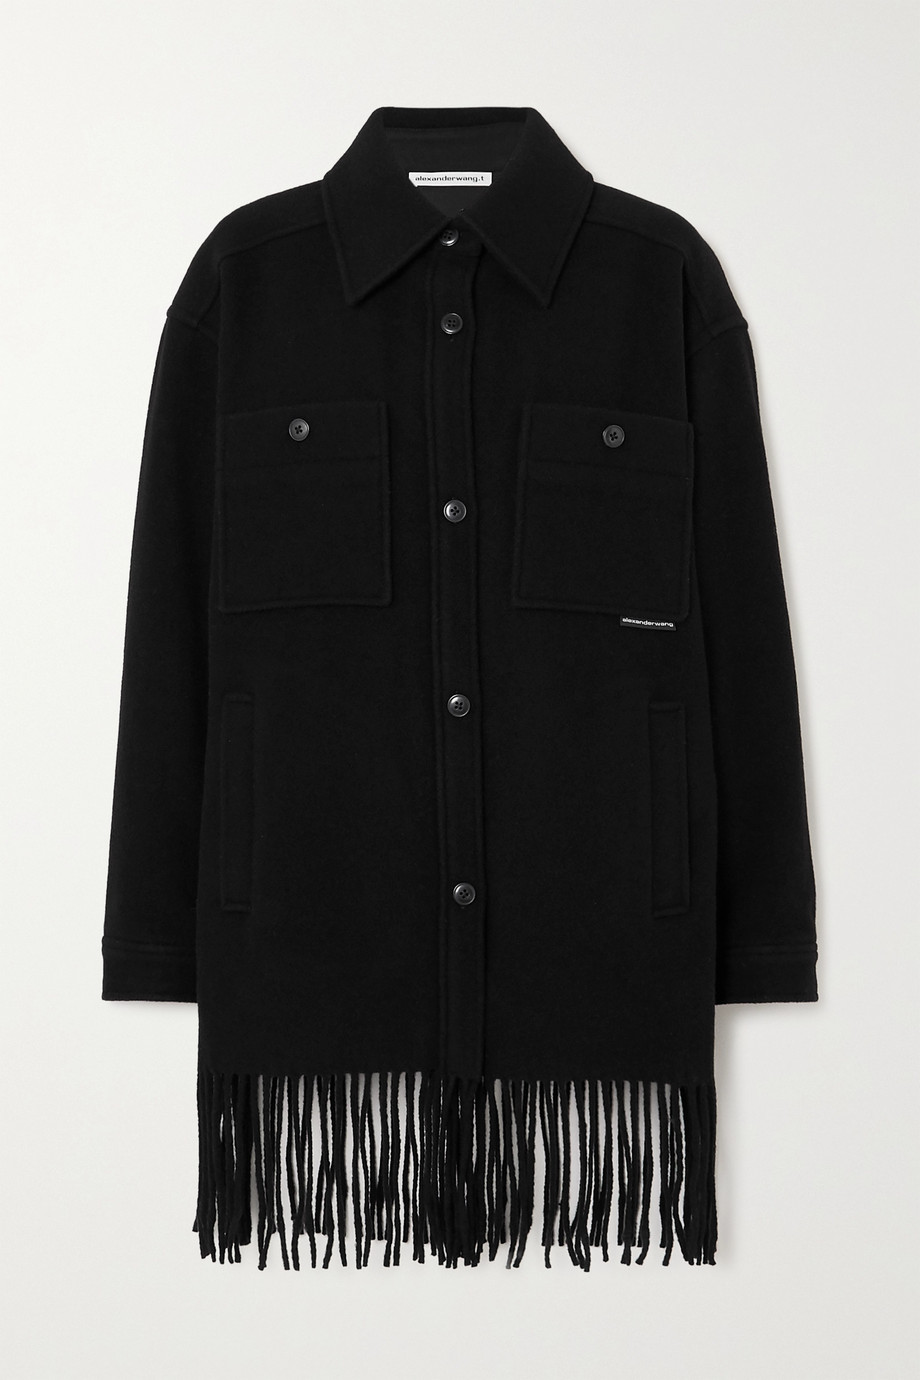 alexanderwang.t Oversized-Mantel aus Wollfilz mit Fransen